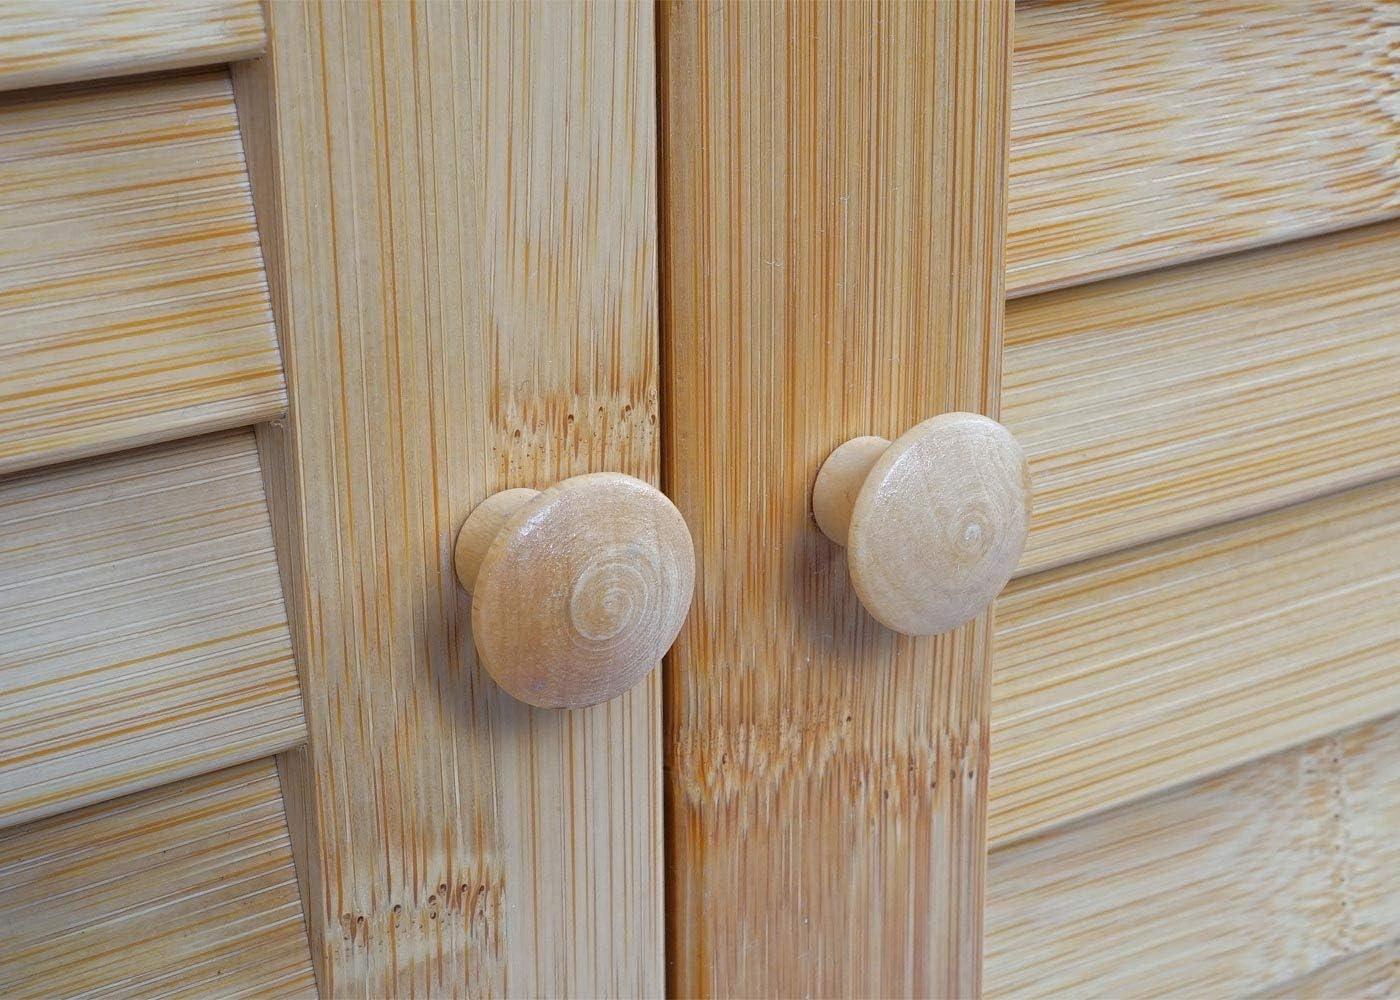 Bambus ~ 60x80x40cm Badezimmer Badschrank Mendler Waschbeckenunterschrank HWC-B18